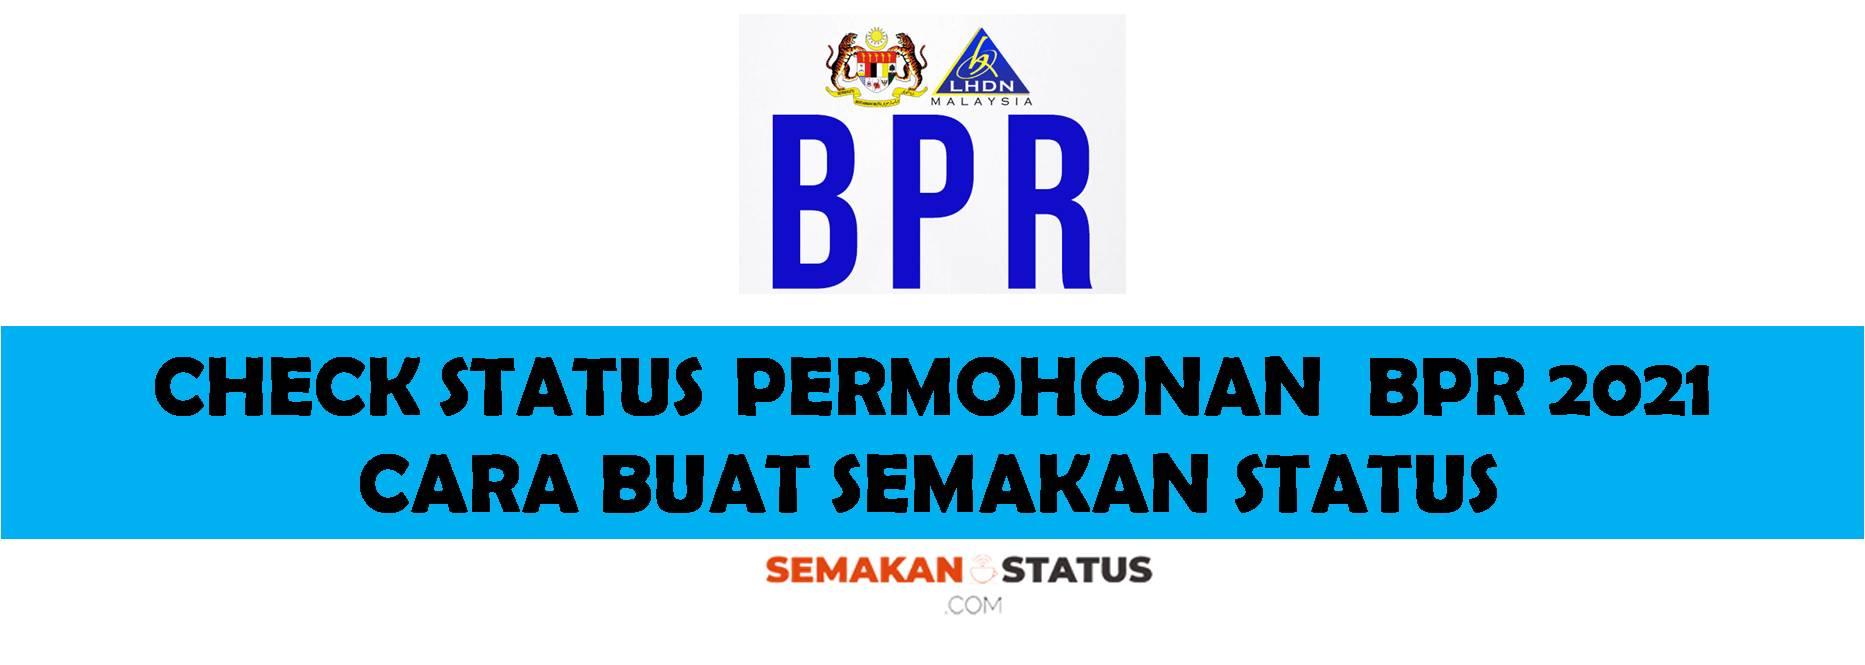 CHECK STATUS PERMOHONAN BPR 2021